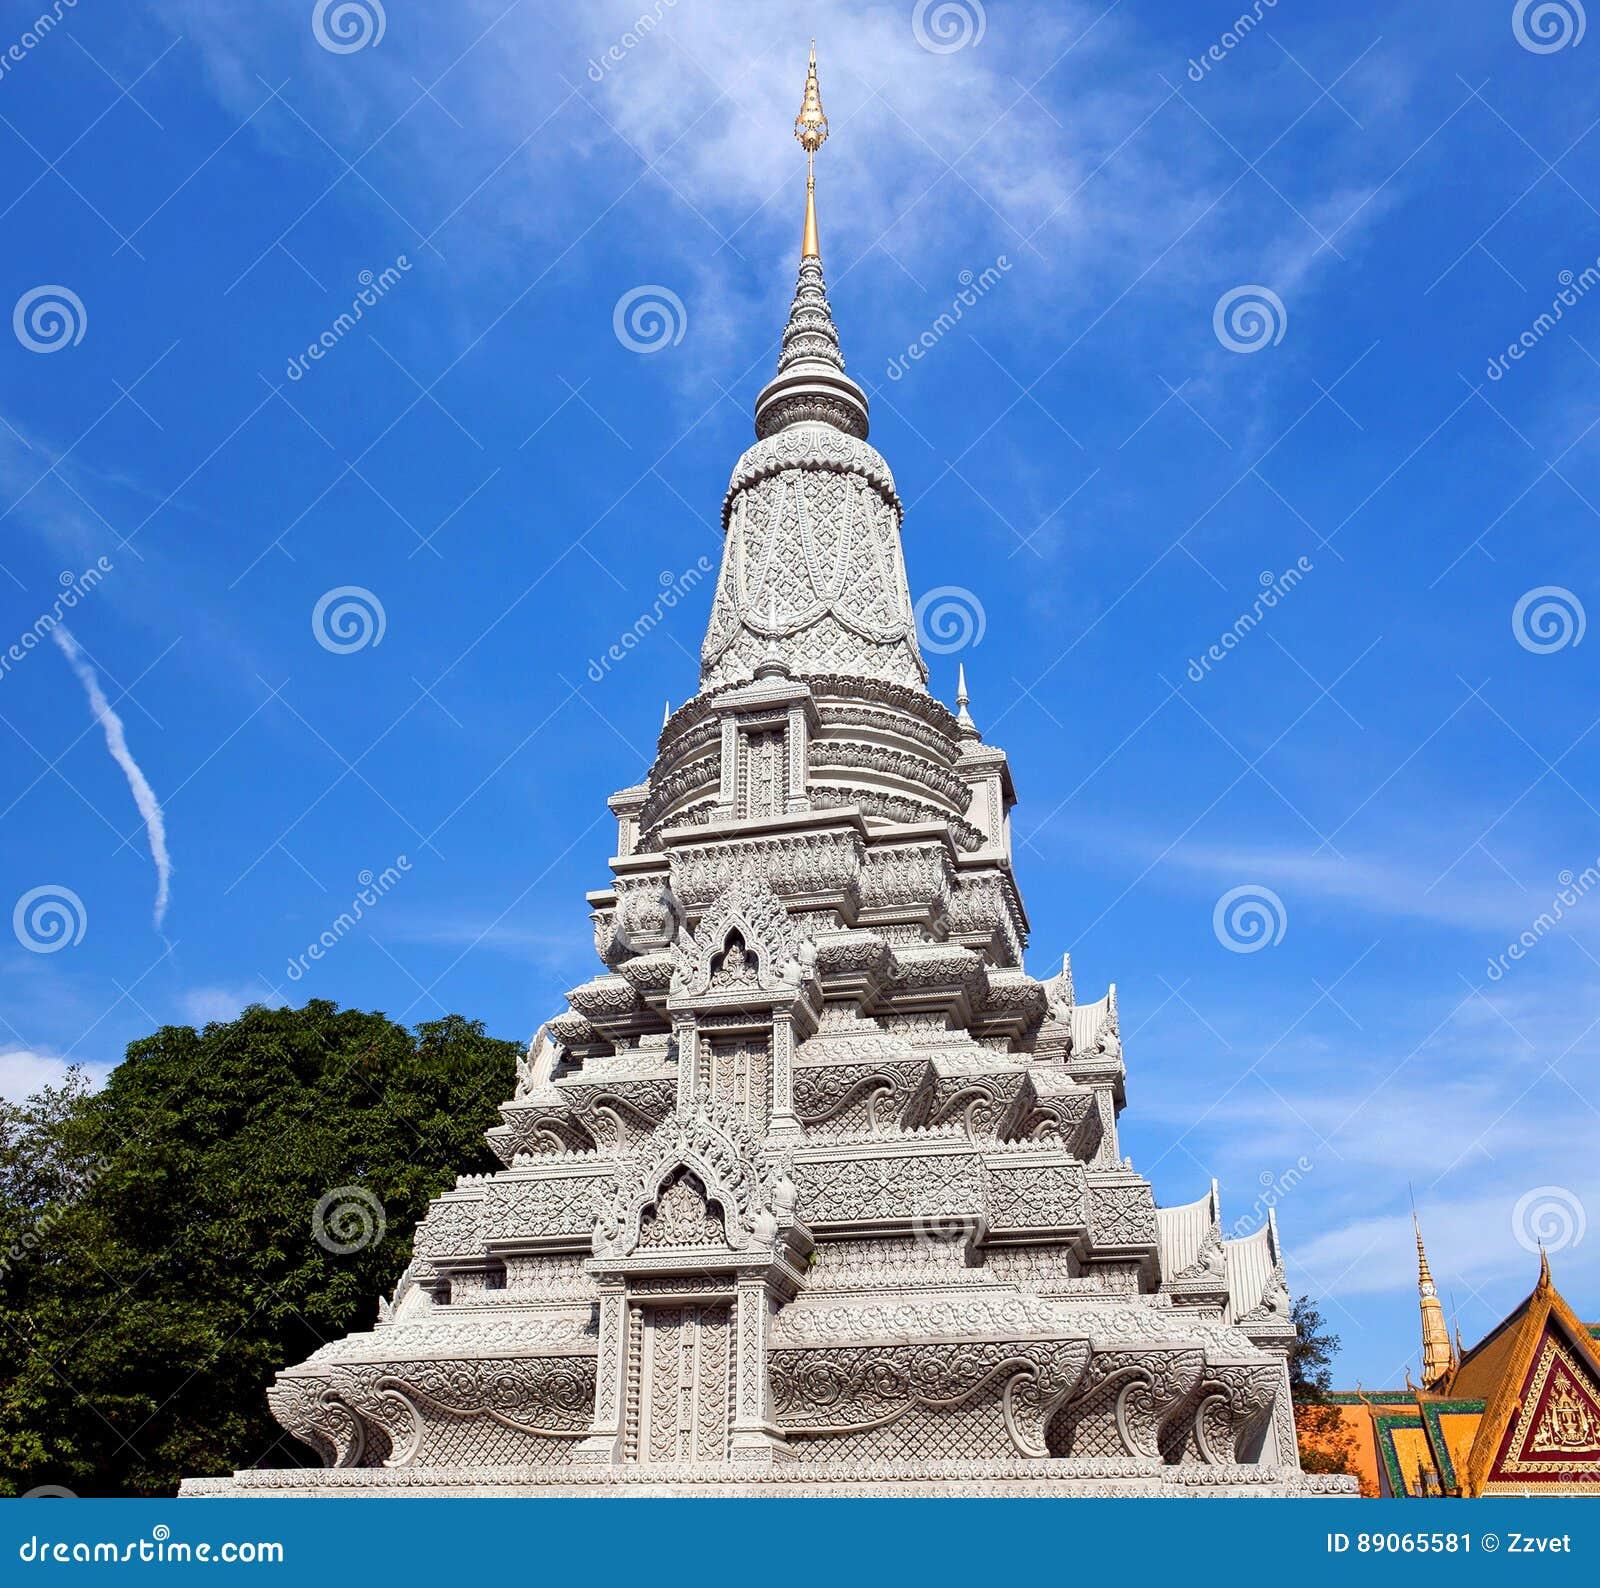 Stupa Of King Norodom Suramarit In Phnom Penh, Cambodia Stock ...